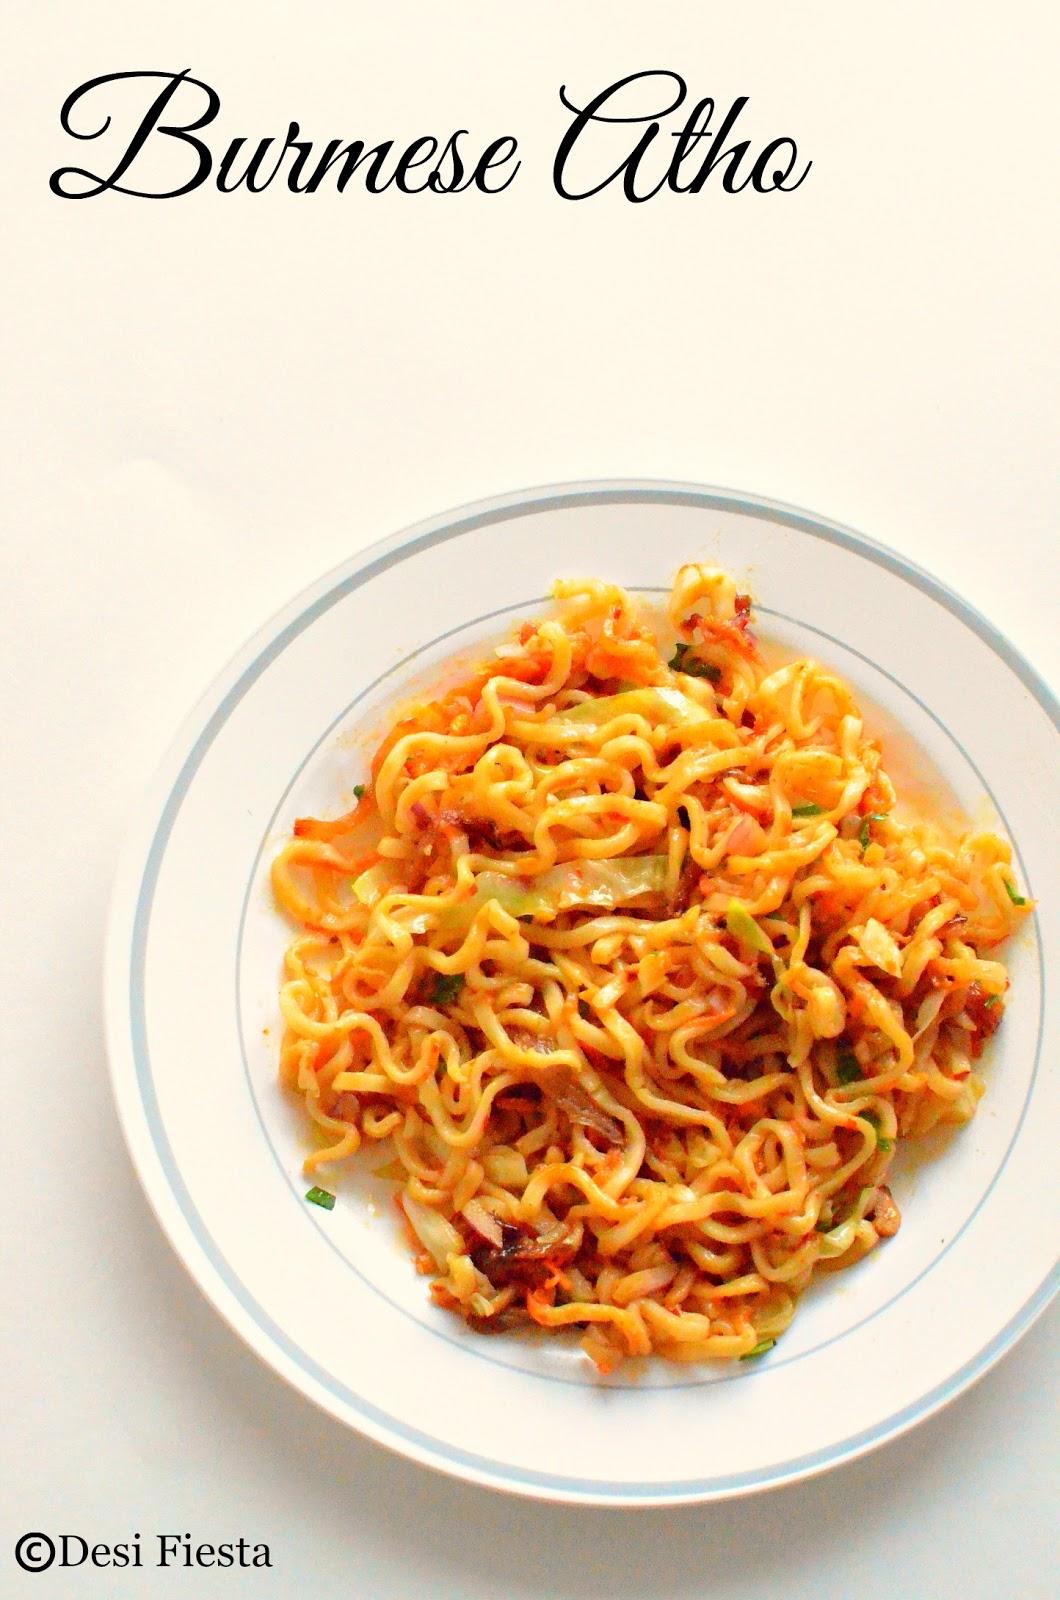 Burmese Noodle Recipes